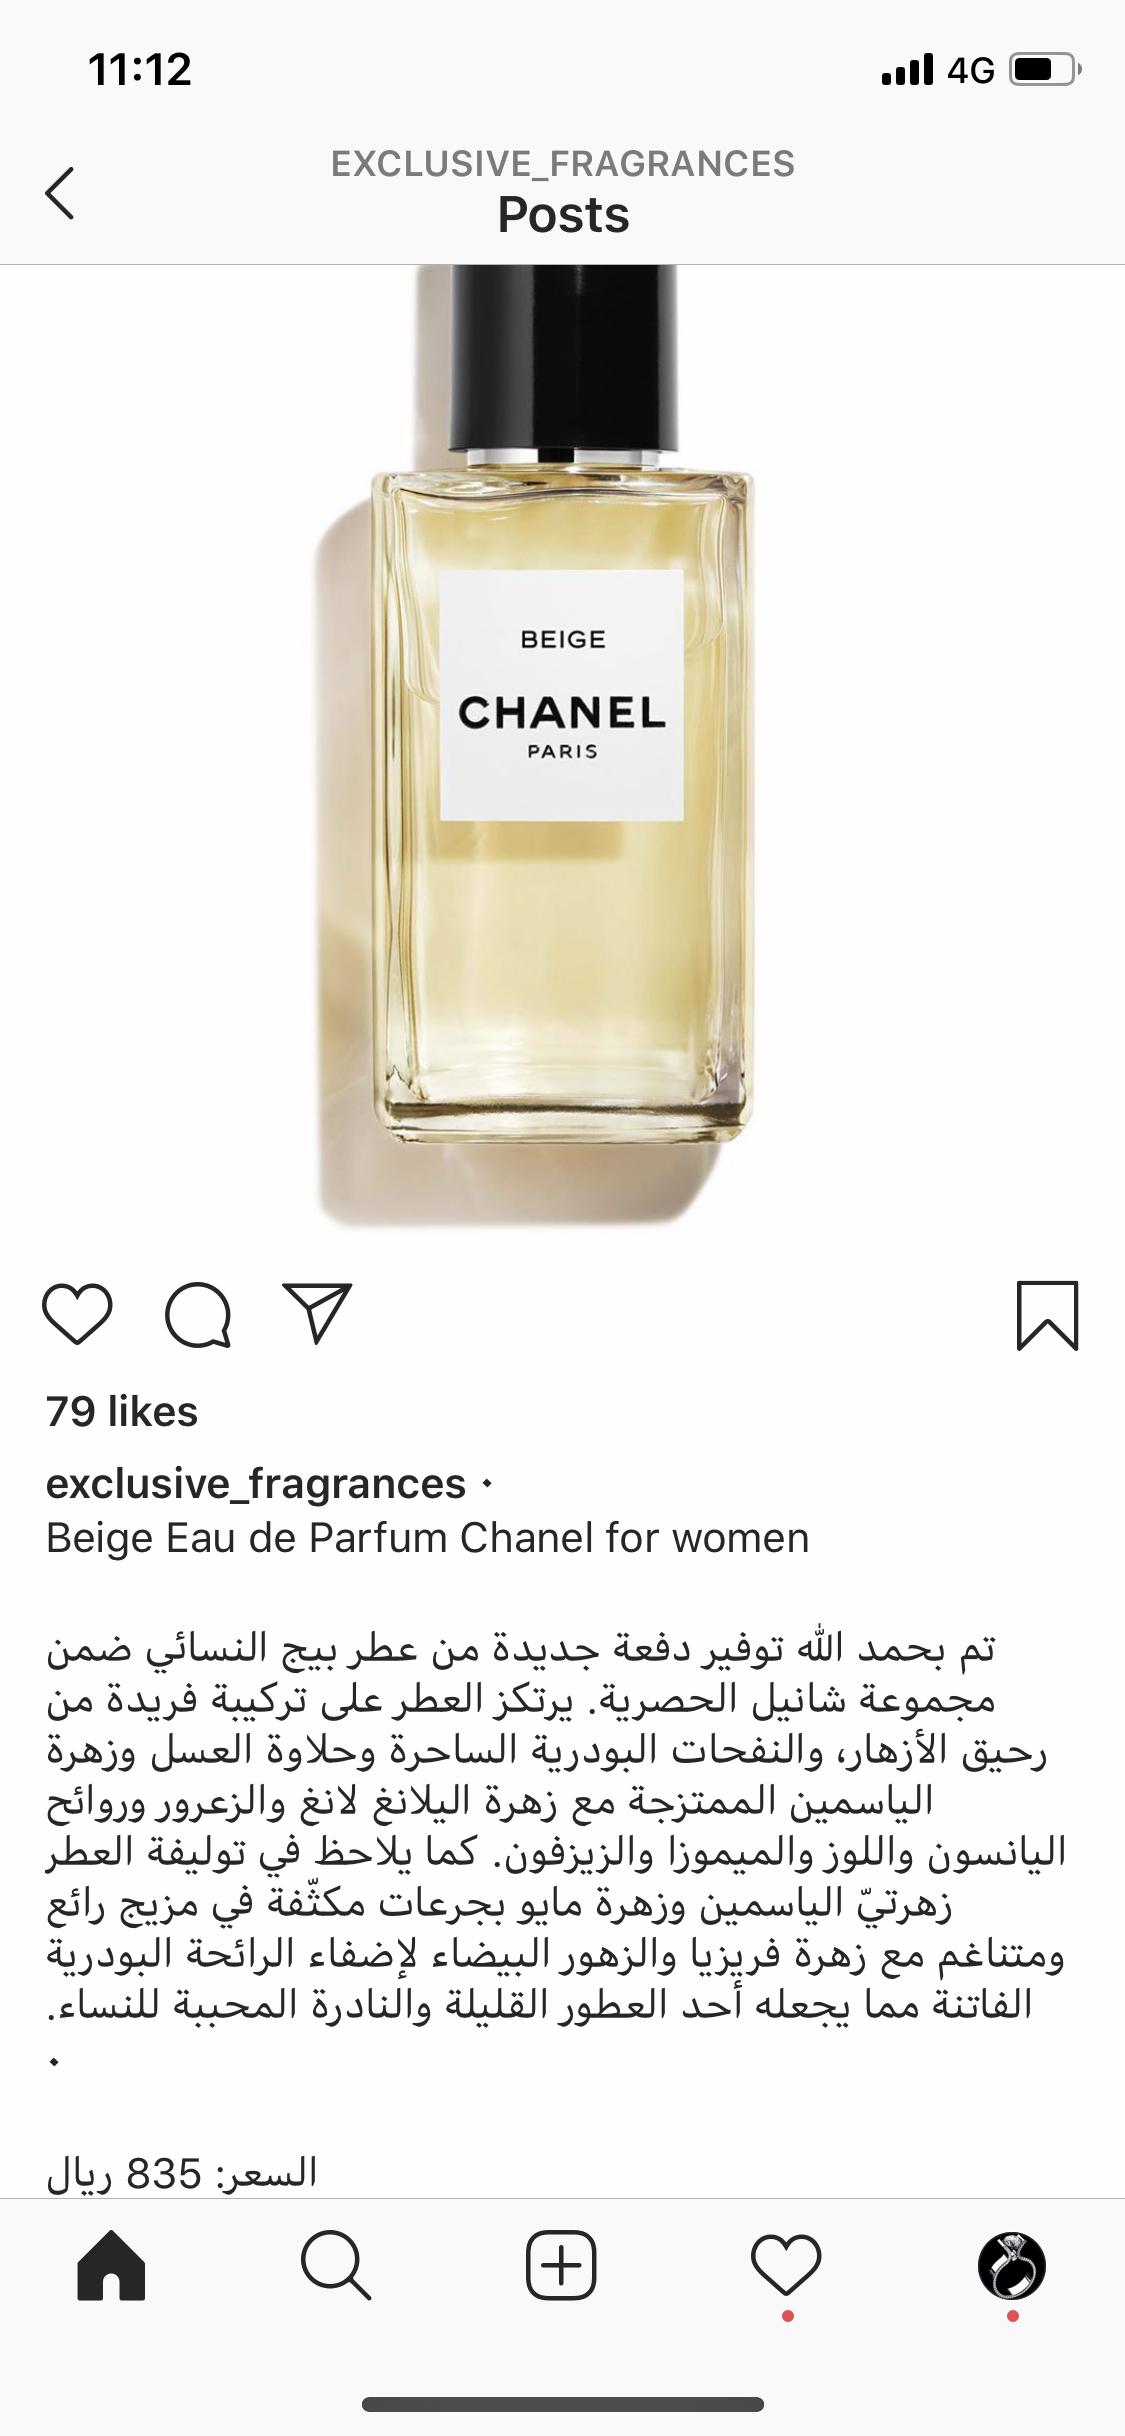 Pin By Samar Anan On عطور فرنسية Chanel Perfume Eau De Parfum Exclusive Fragrance